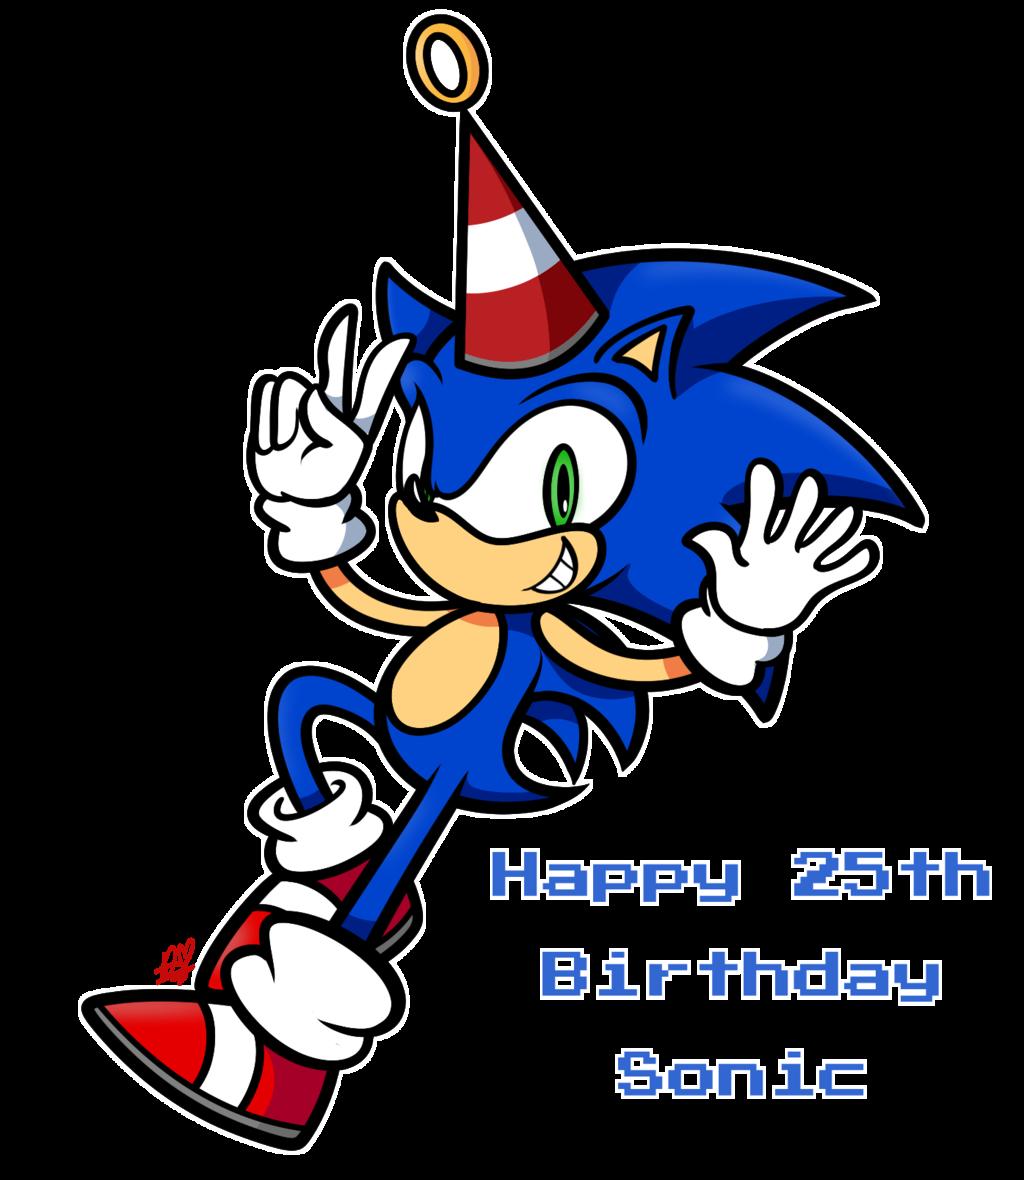 Happy 25th Birthday Sonic ~